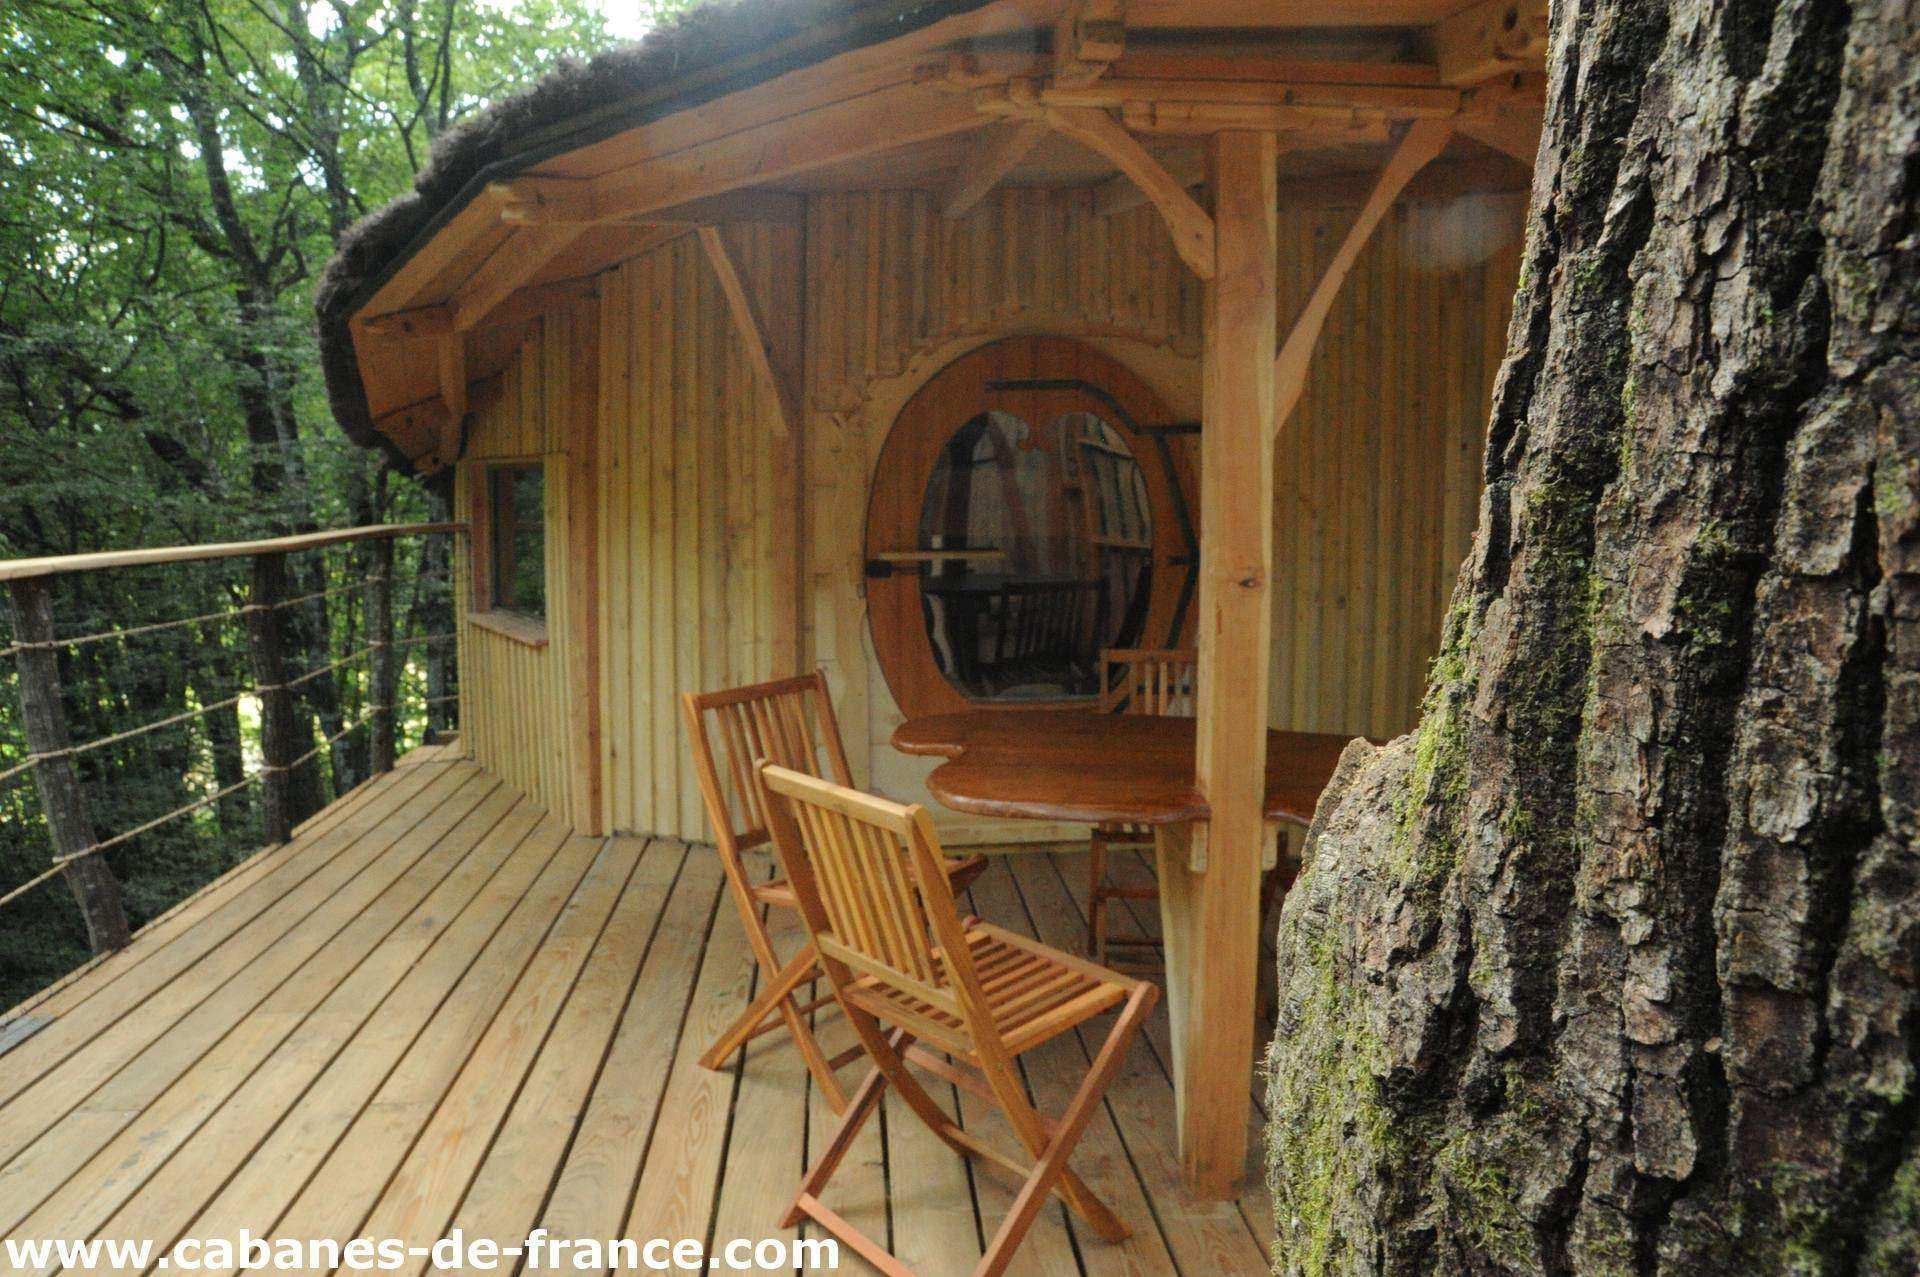 tad goz les cabanes du bois clair cabane dans les arbres en franche comt cabanes de france. Black Bedroom Furniture Sets. Home Design Ideas